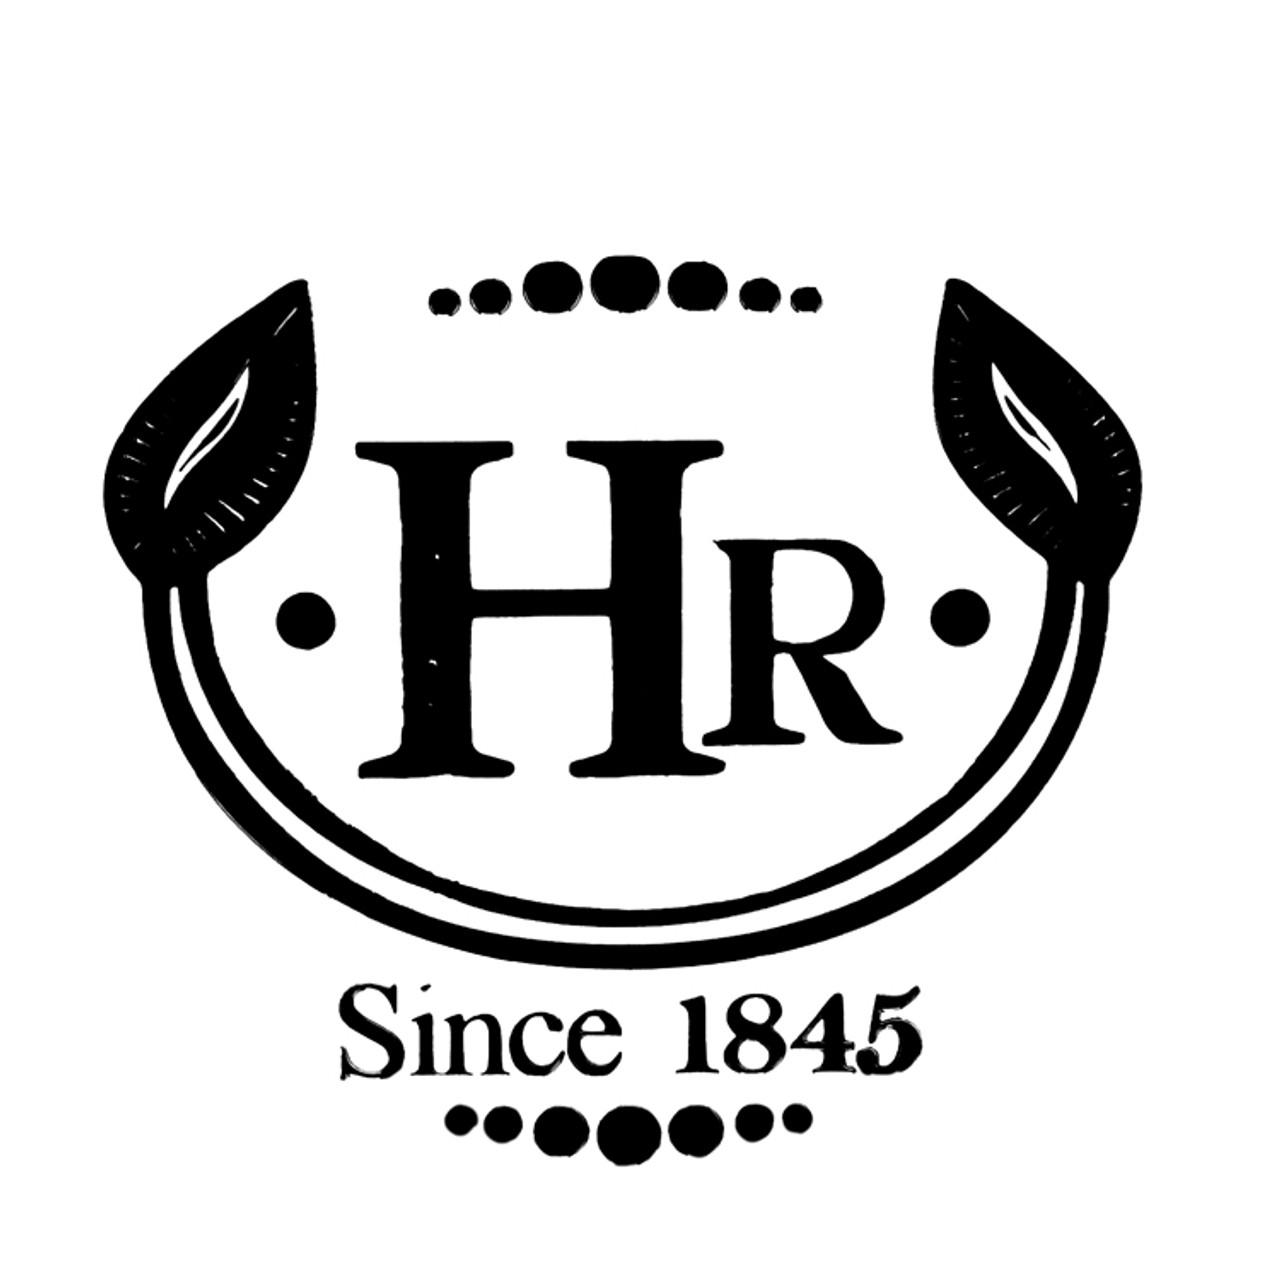 H.R. Blue Corona Gordo Cigars - 5.5 x 46 (Box of 20)